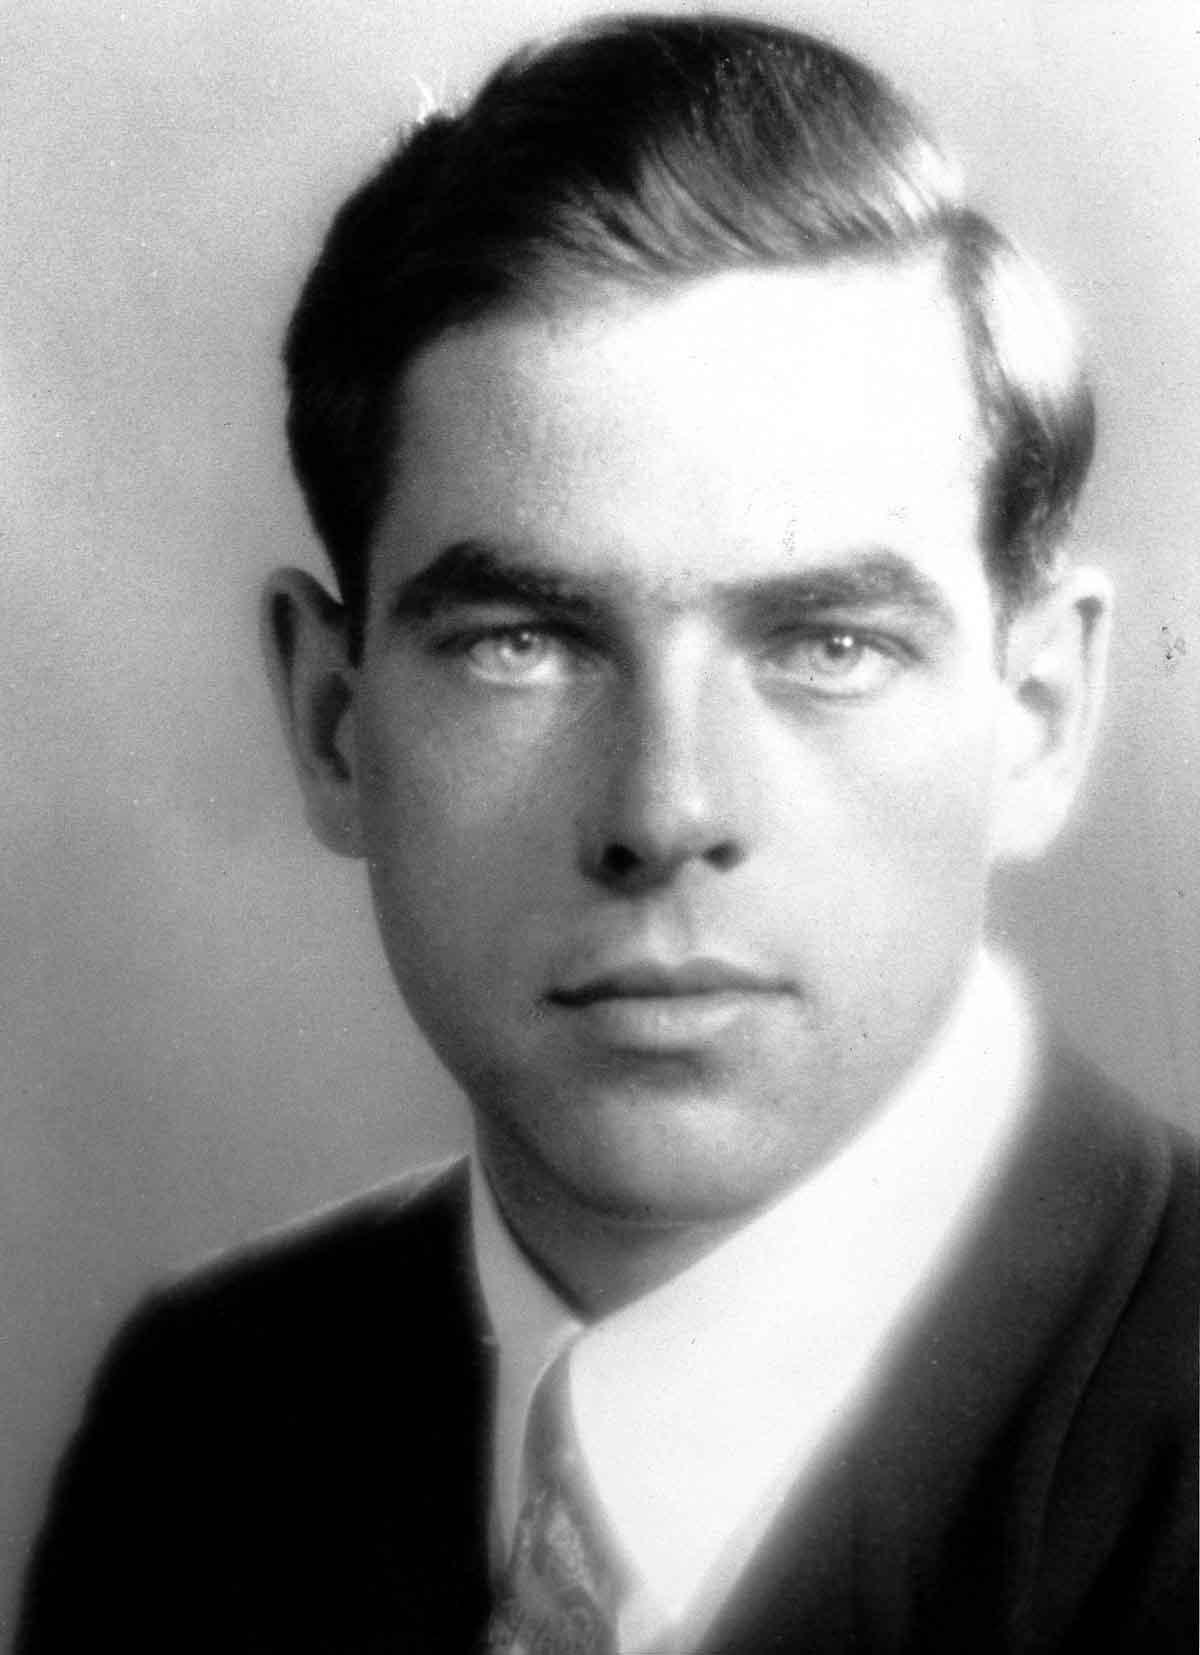 Joseph Campbell at the University of Paris, c. 1927